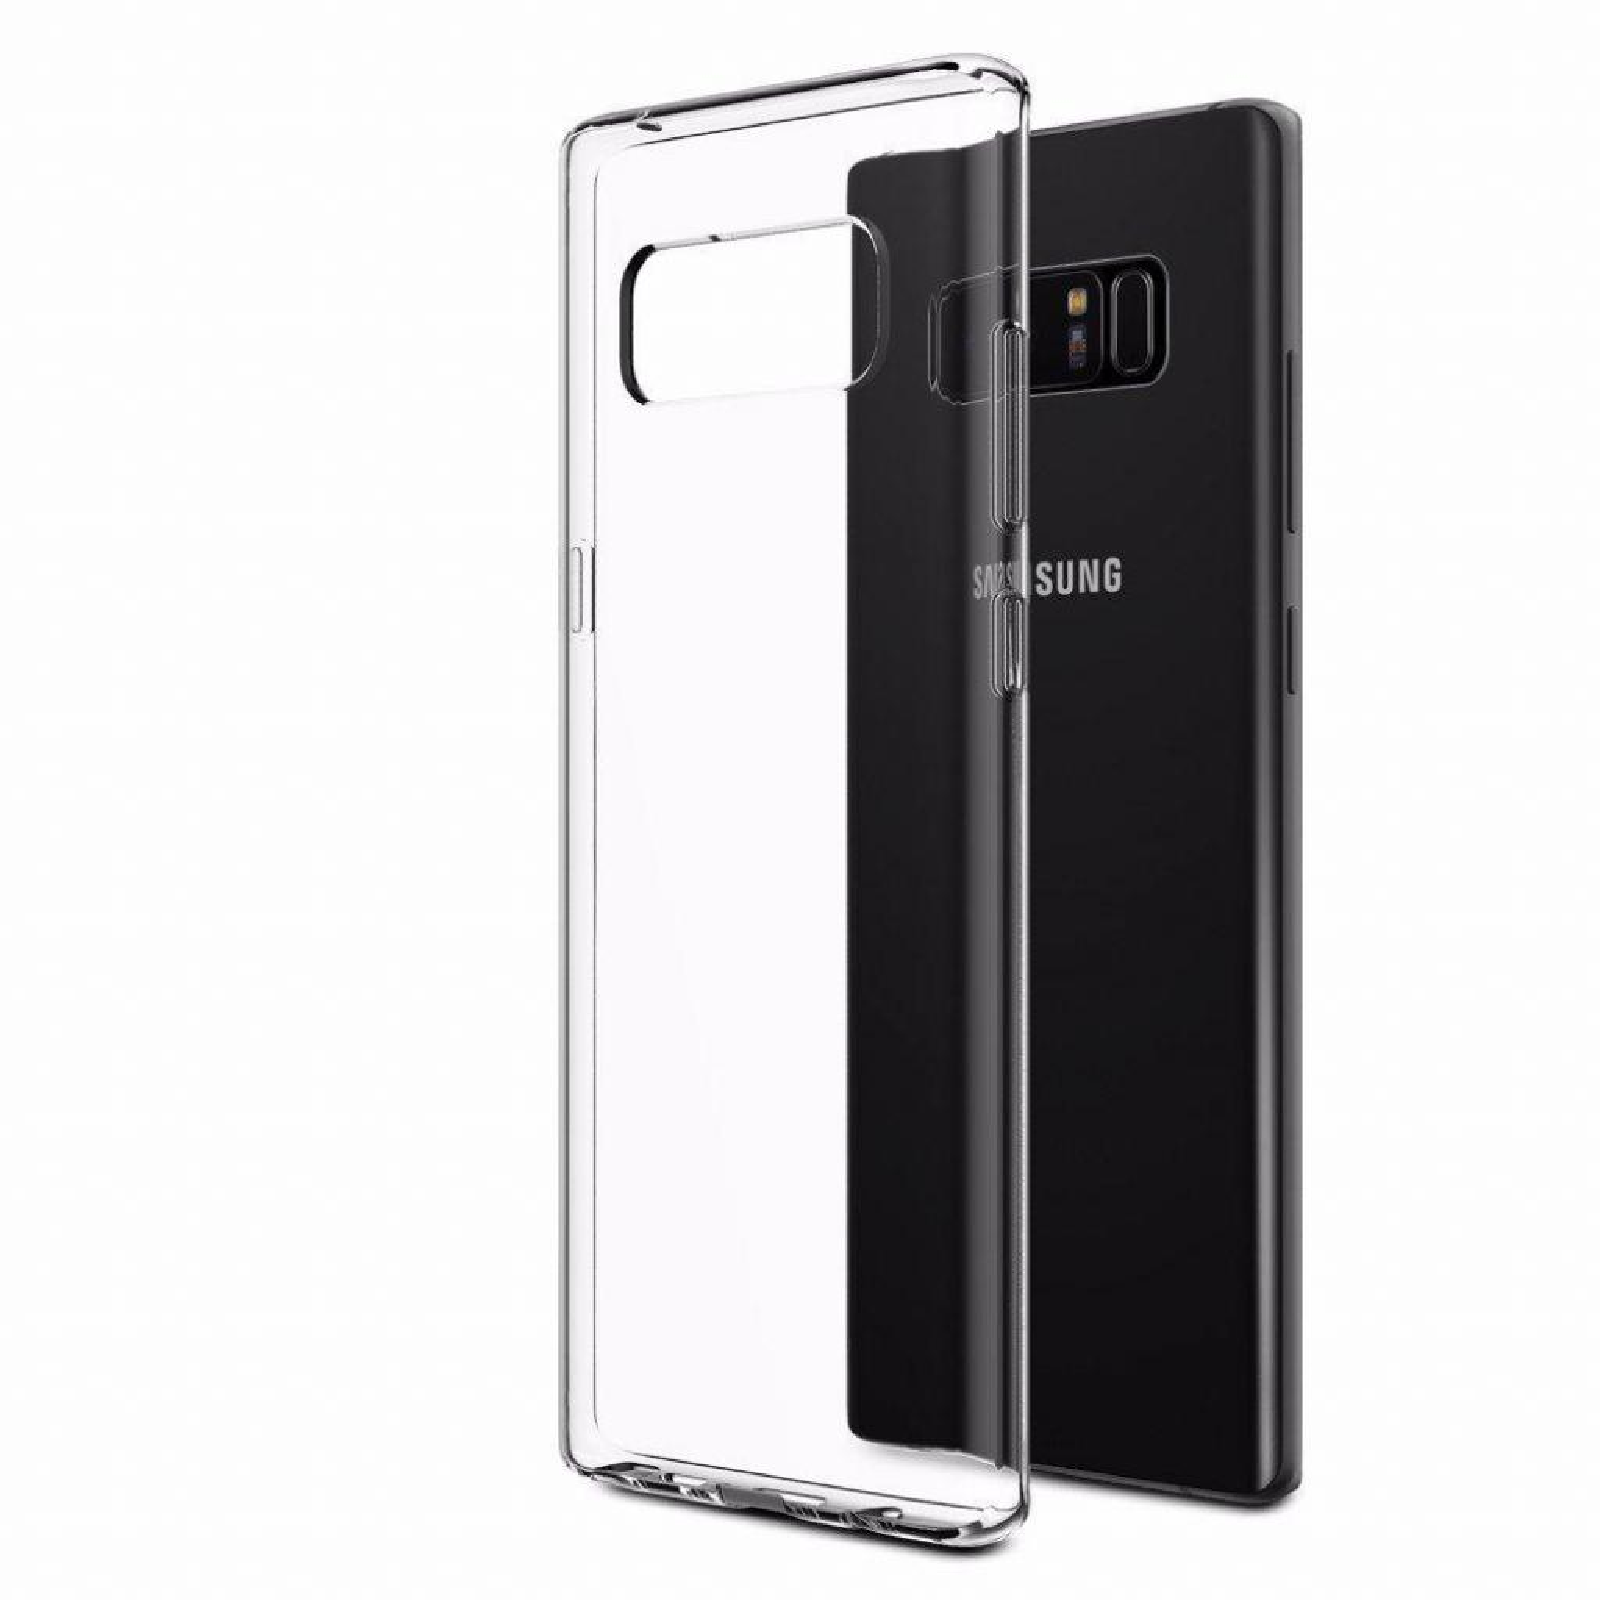 Чехол для моб. телефона SmartCase Samsung Galaxy Note 8 / SM-N950 TPU Clear (SC-GN8) изображение 6